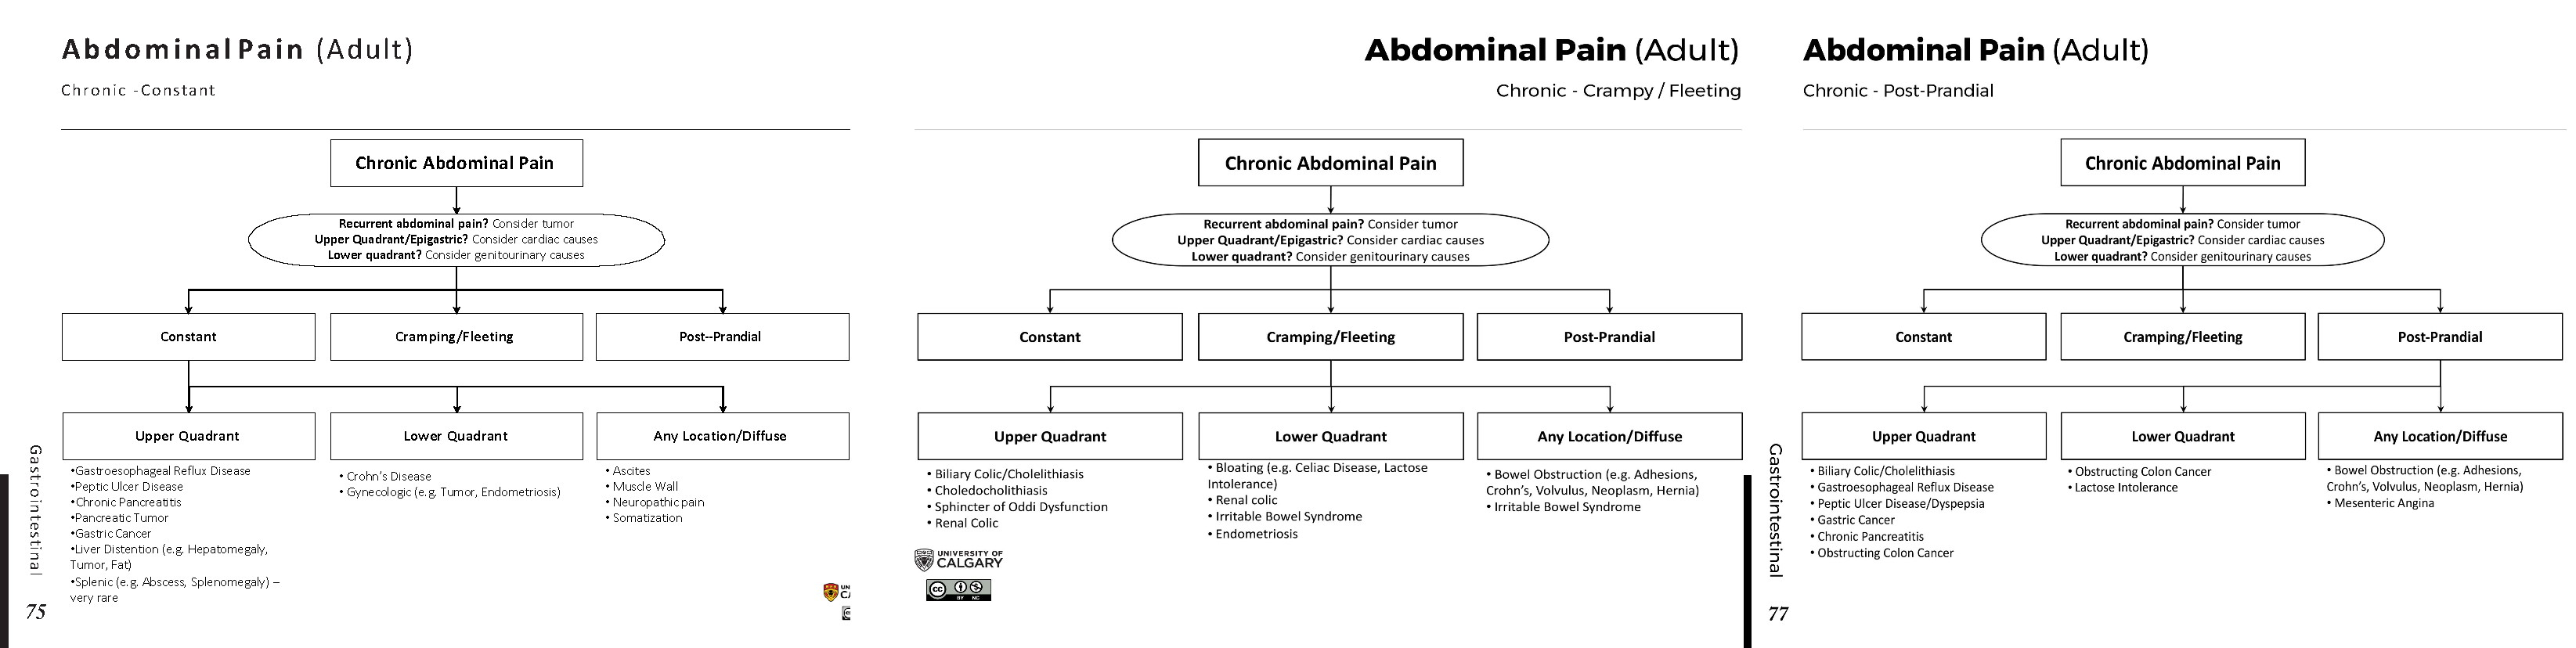 Chronic Abdominal Pain Differential Diagnosis Algorithm Constant Chronic Fleeting Post Prandial Upper Quadrant